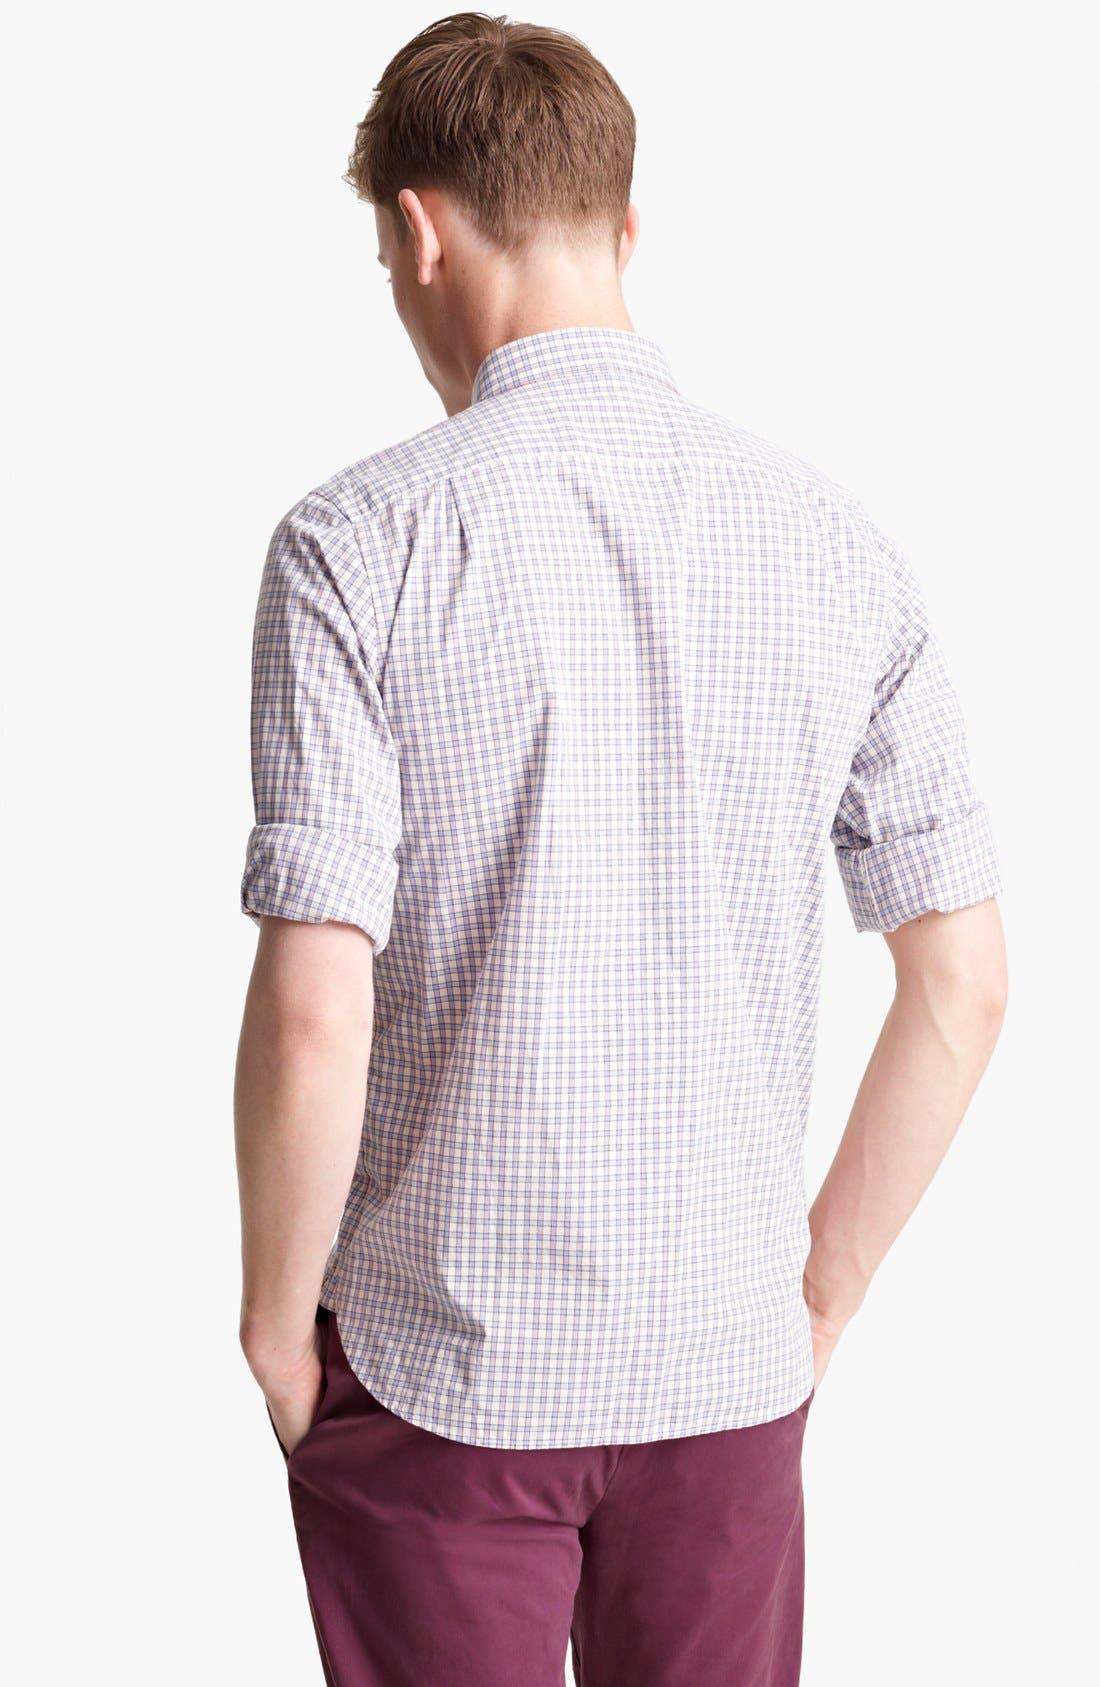 Alternate Image 2  - Jack Spade 'Yates' Check Cotton Shirt